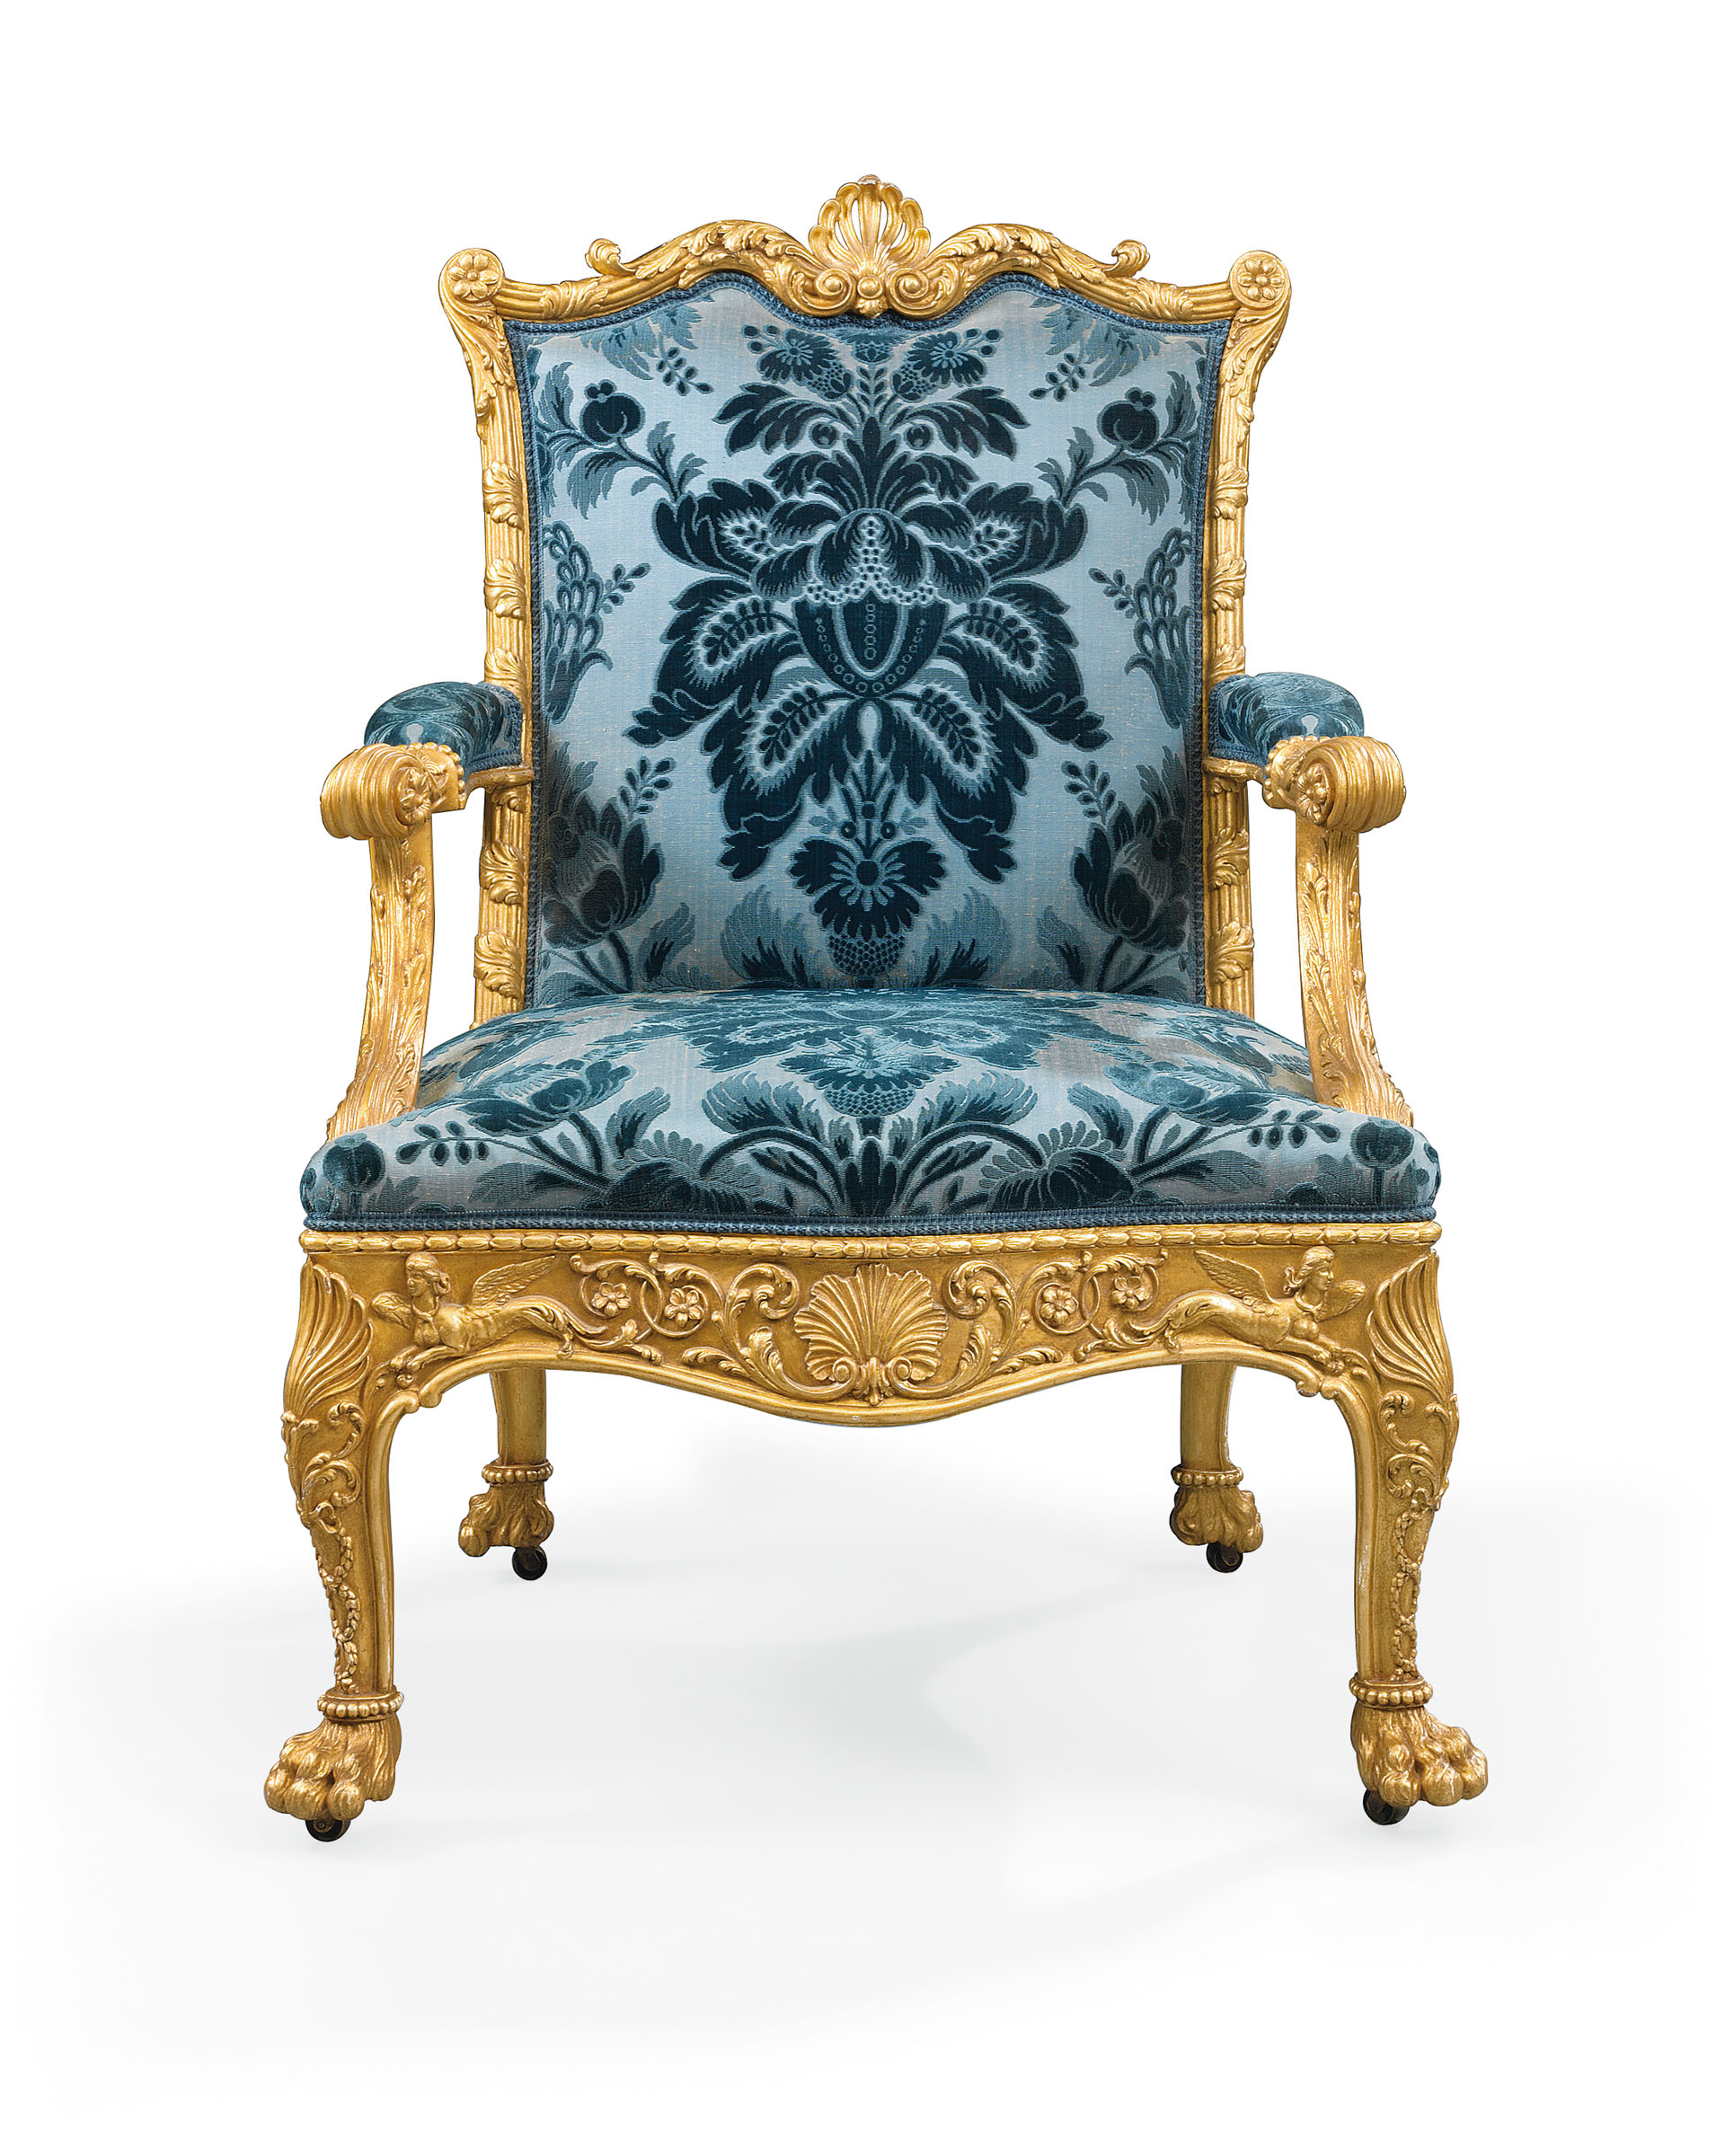 A George Iii Giltwood Armchair Designed By Robert Adam